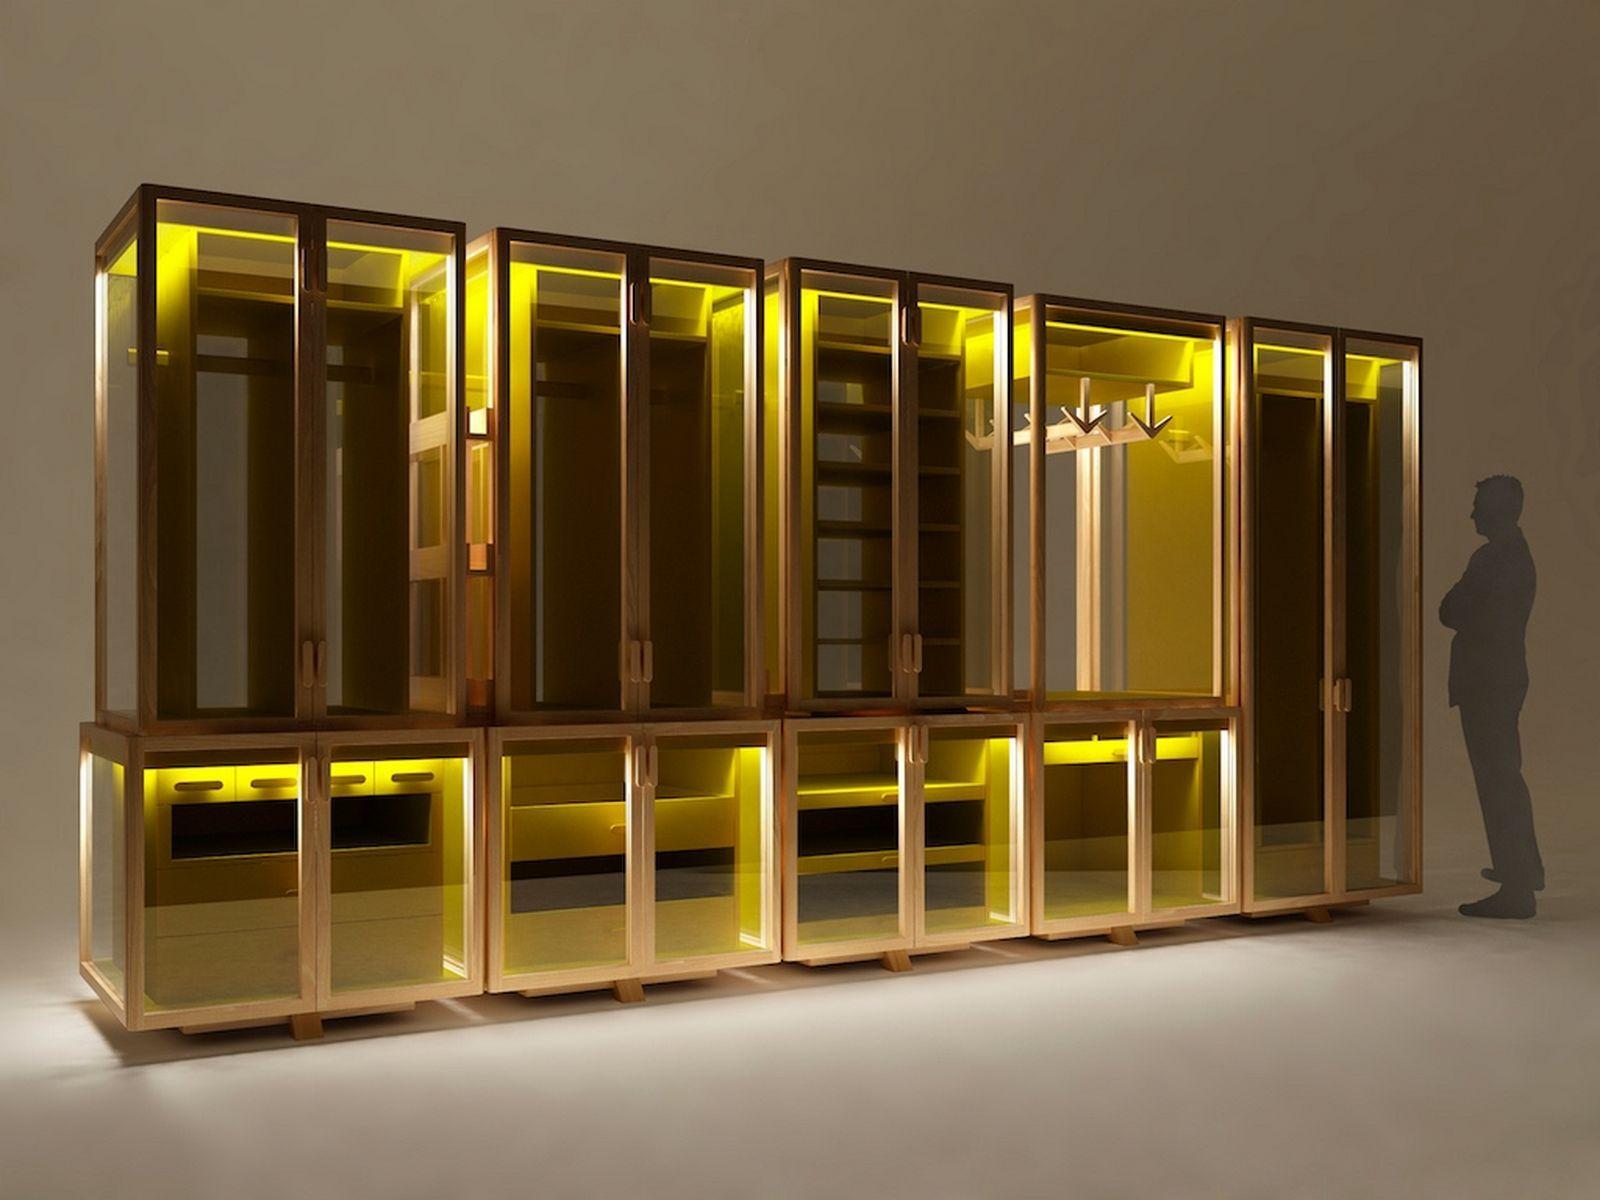 Modular Bedroom Furniture Systems Modular Wardrobe Systems Creative And Flexible Modular Wardrobe